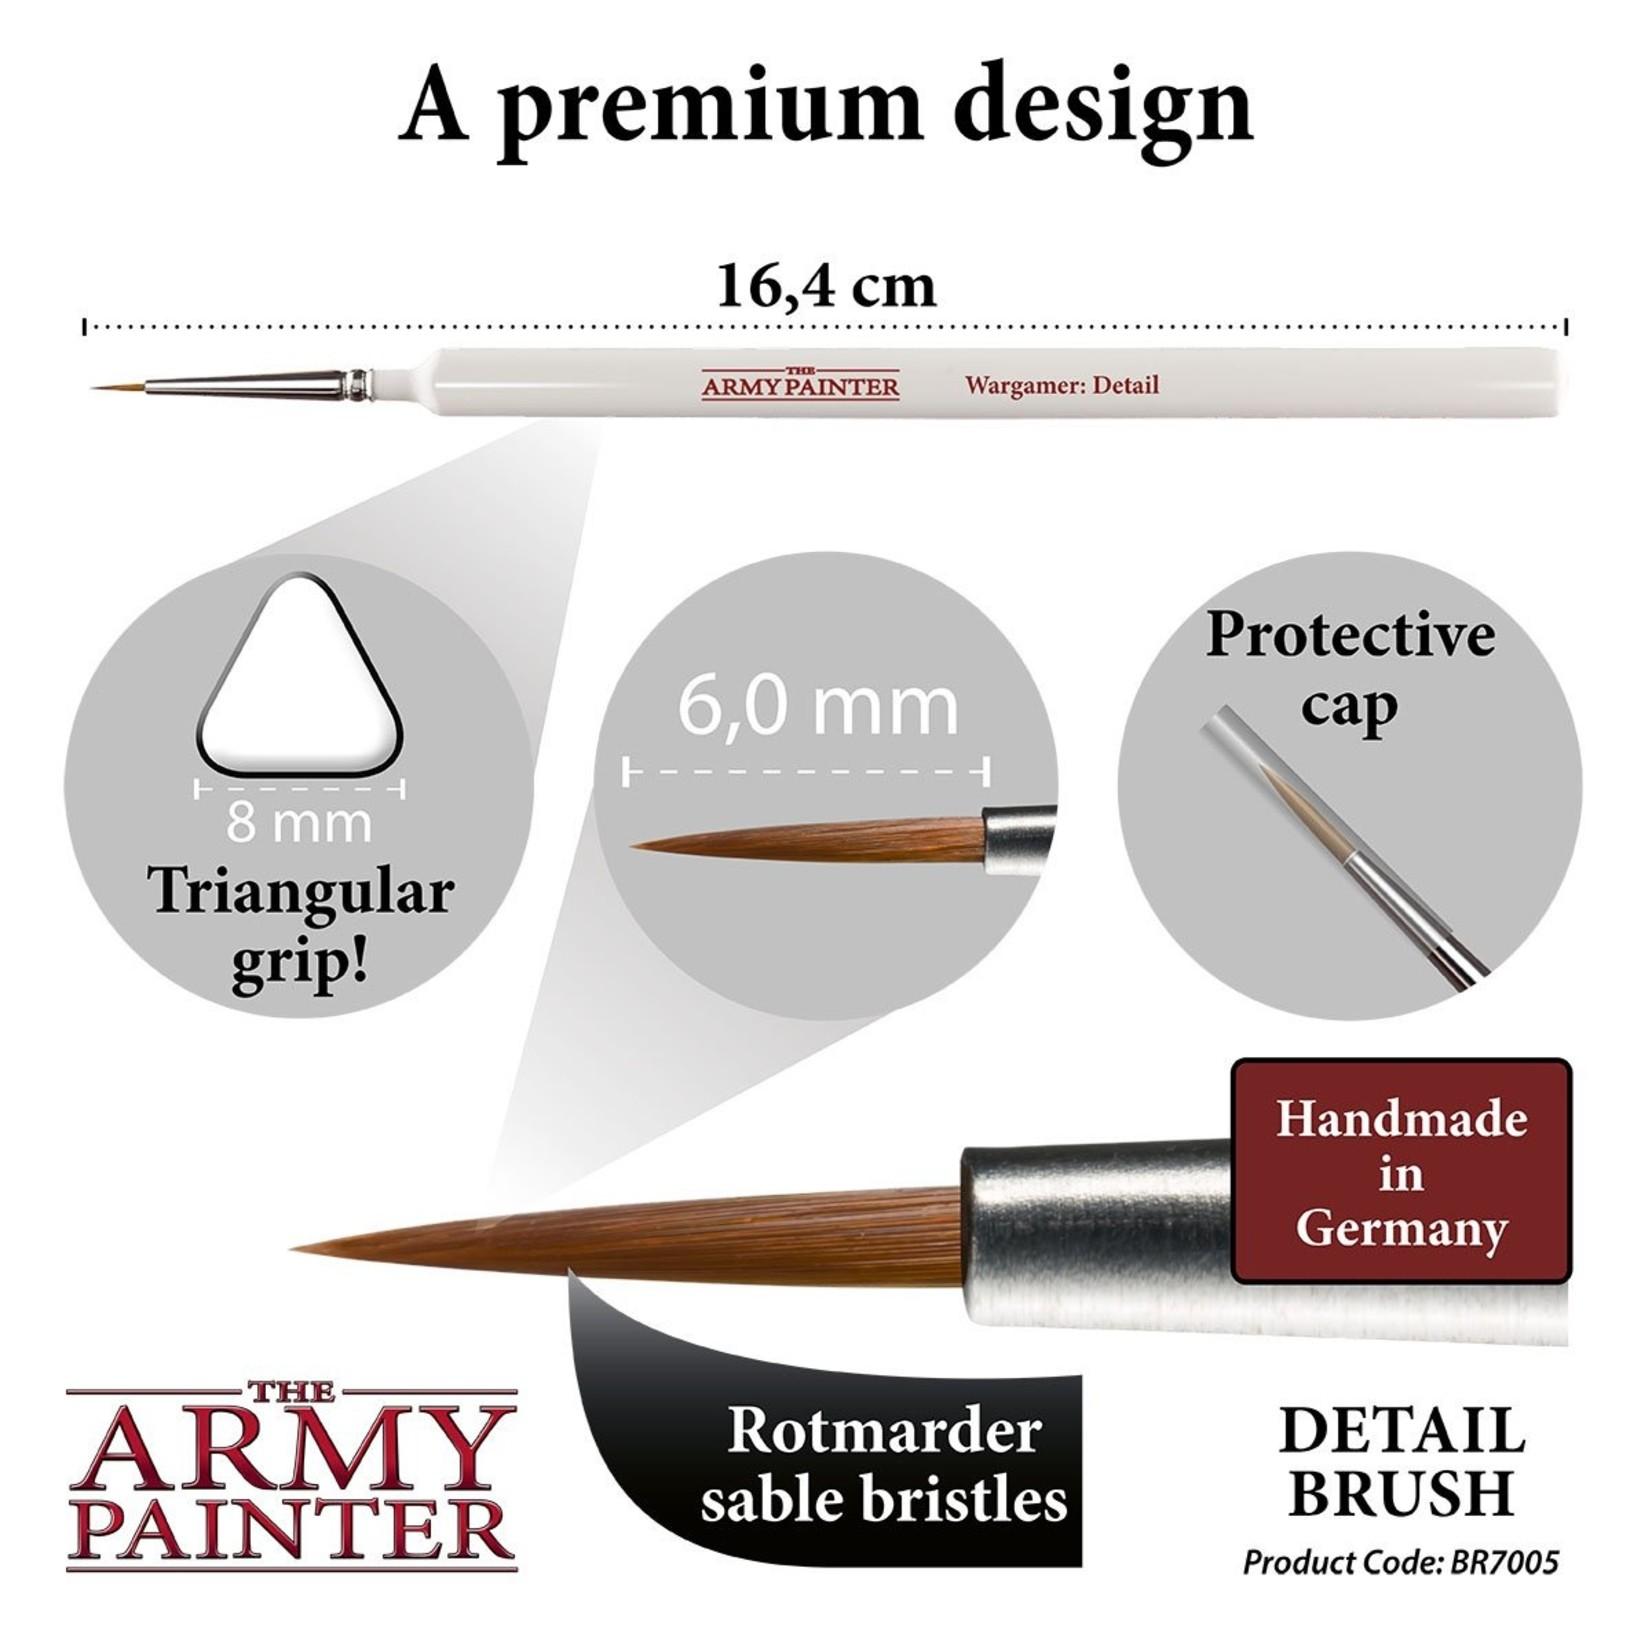 The Army Painter 7005 Wargamer Brush Detail